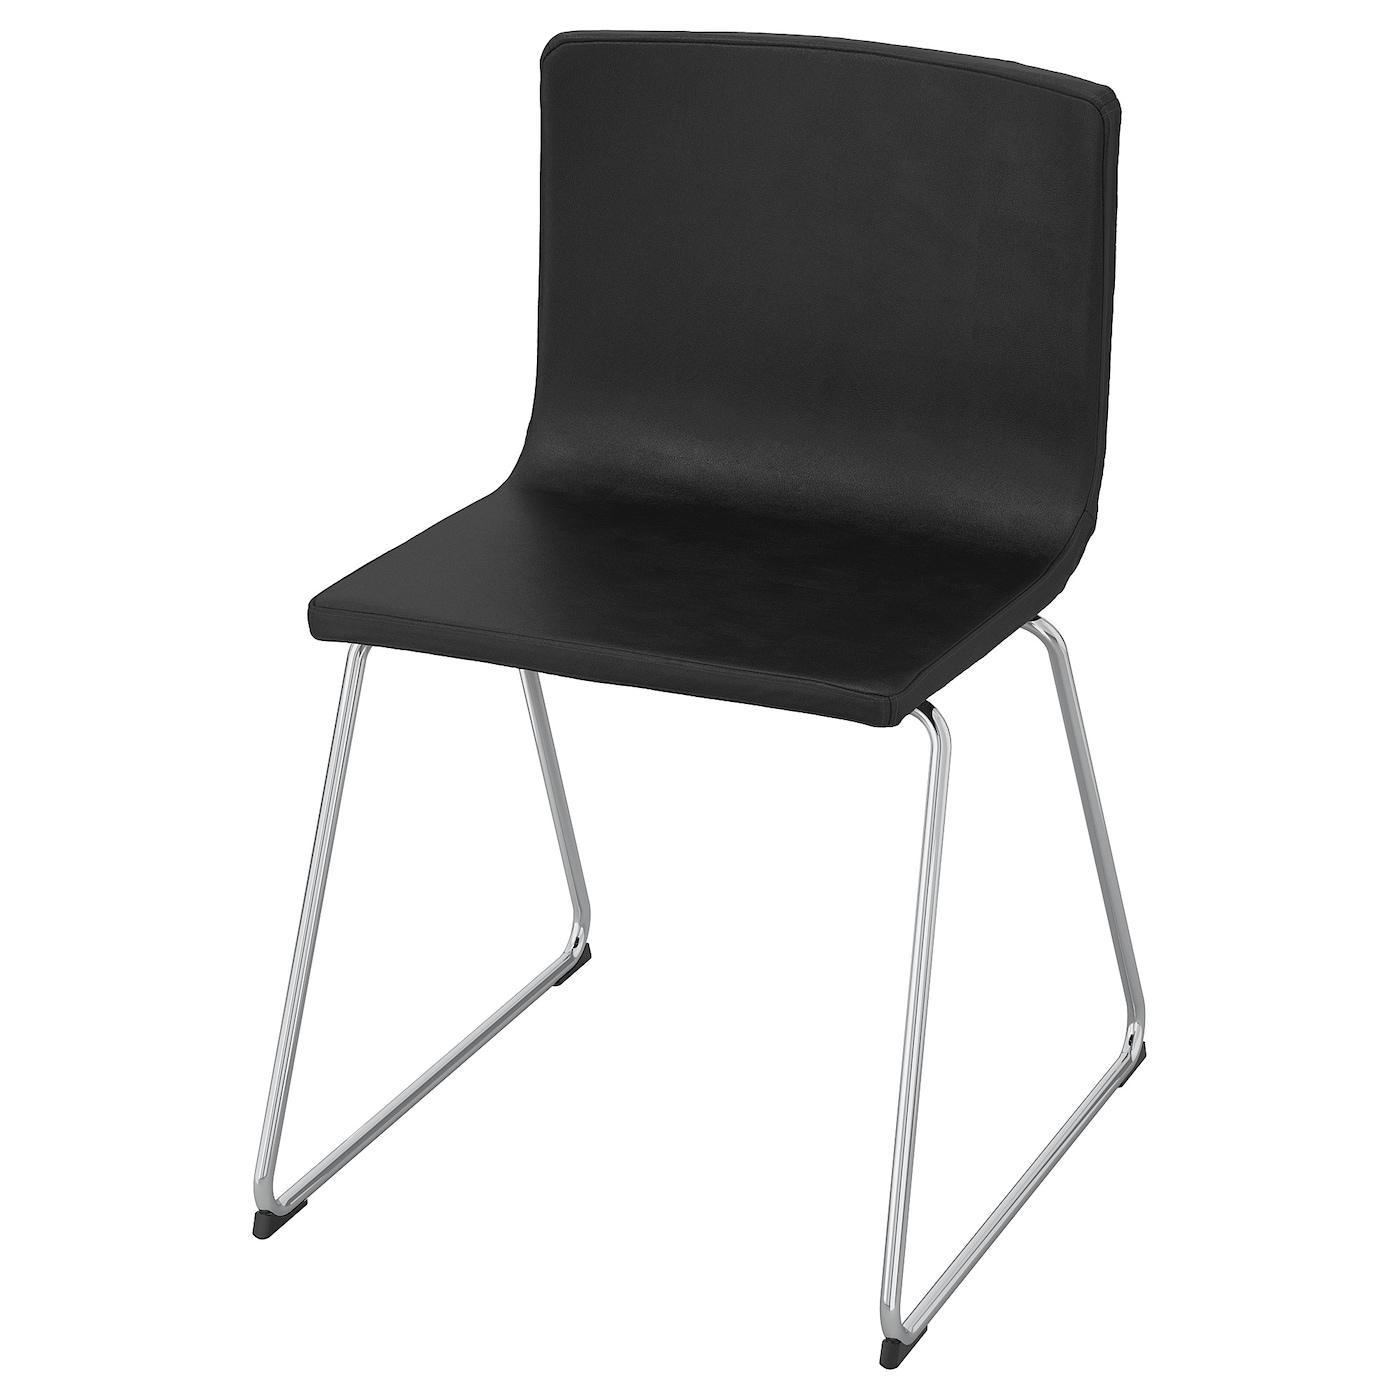 Ikea Stuhl Schwarz Metall